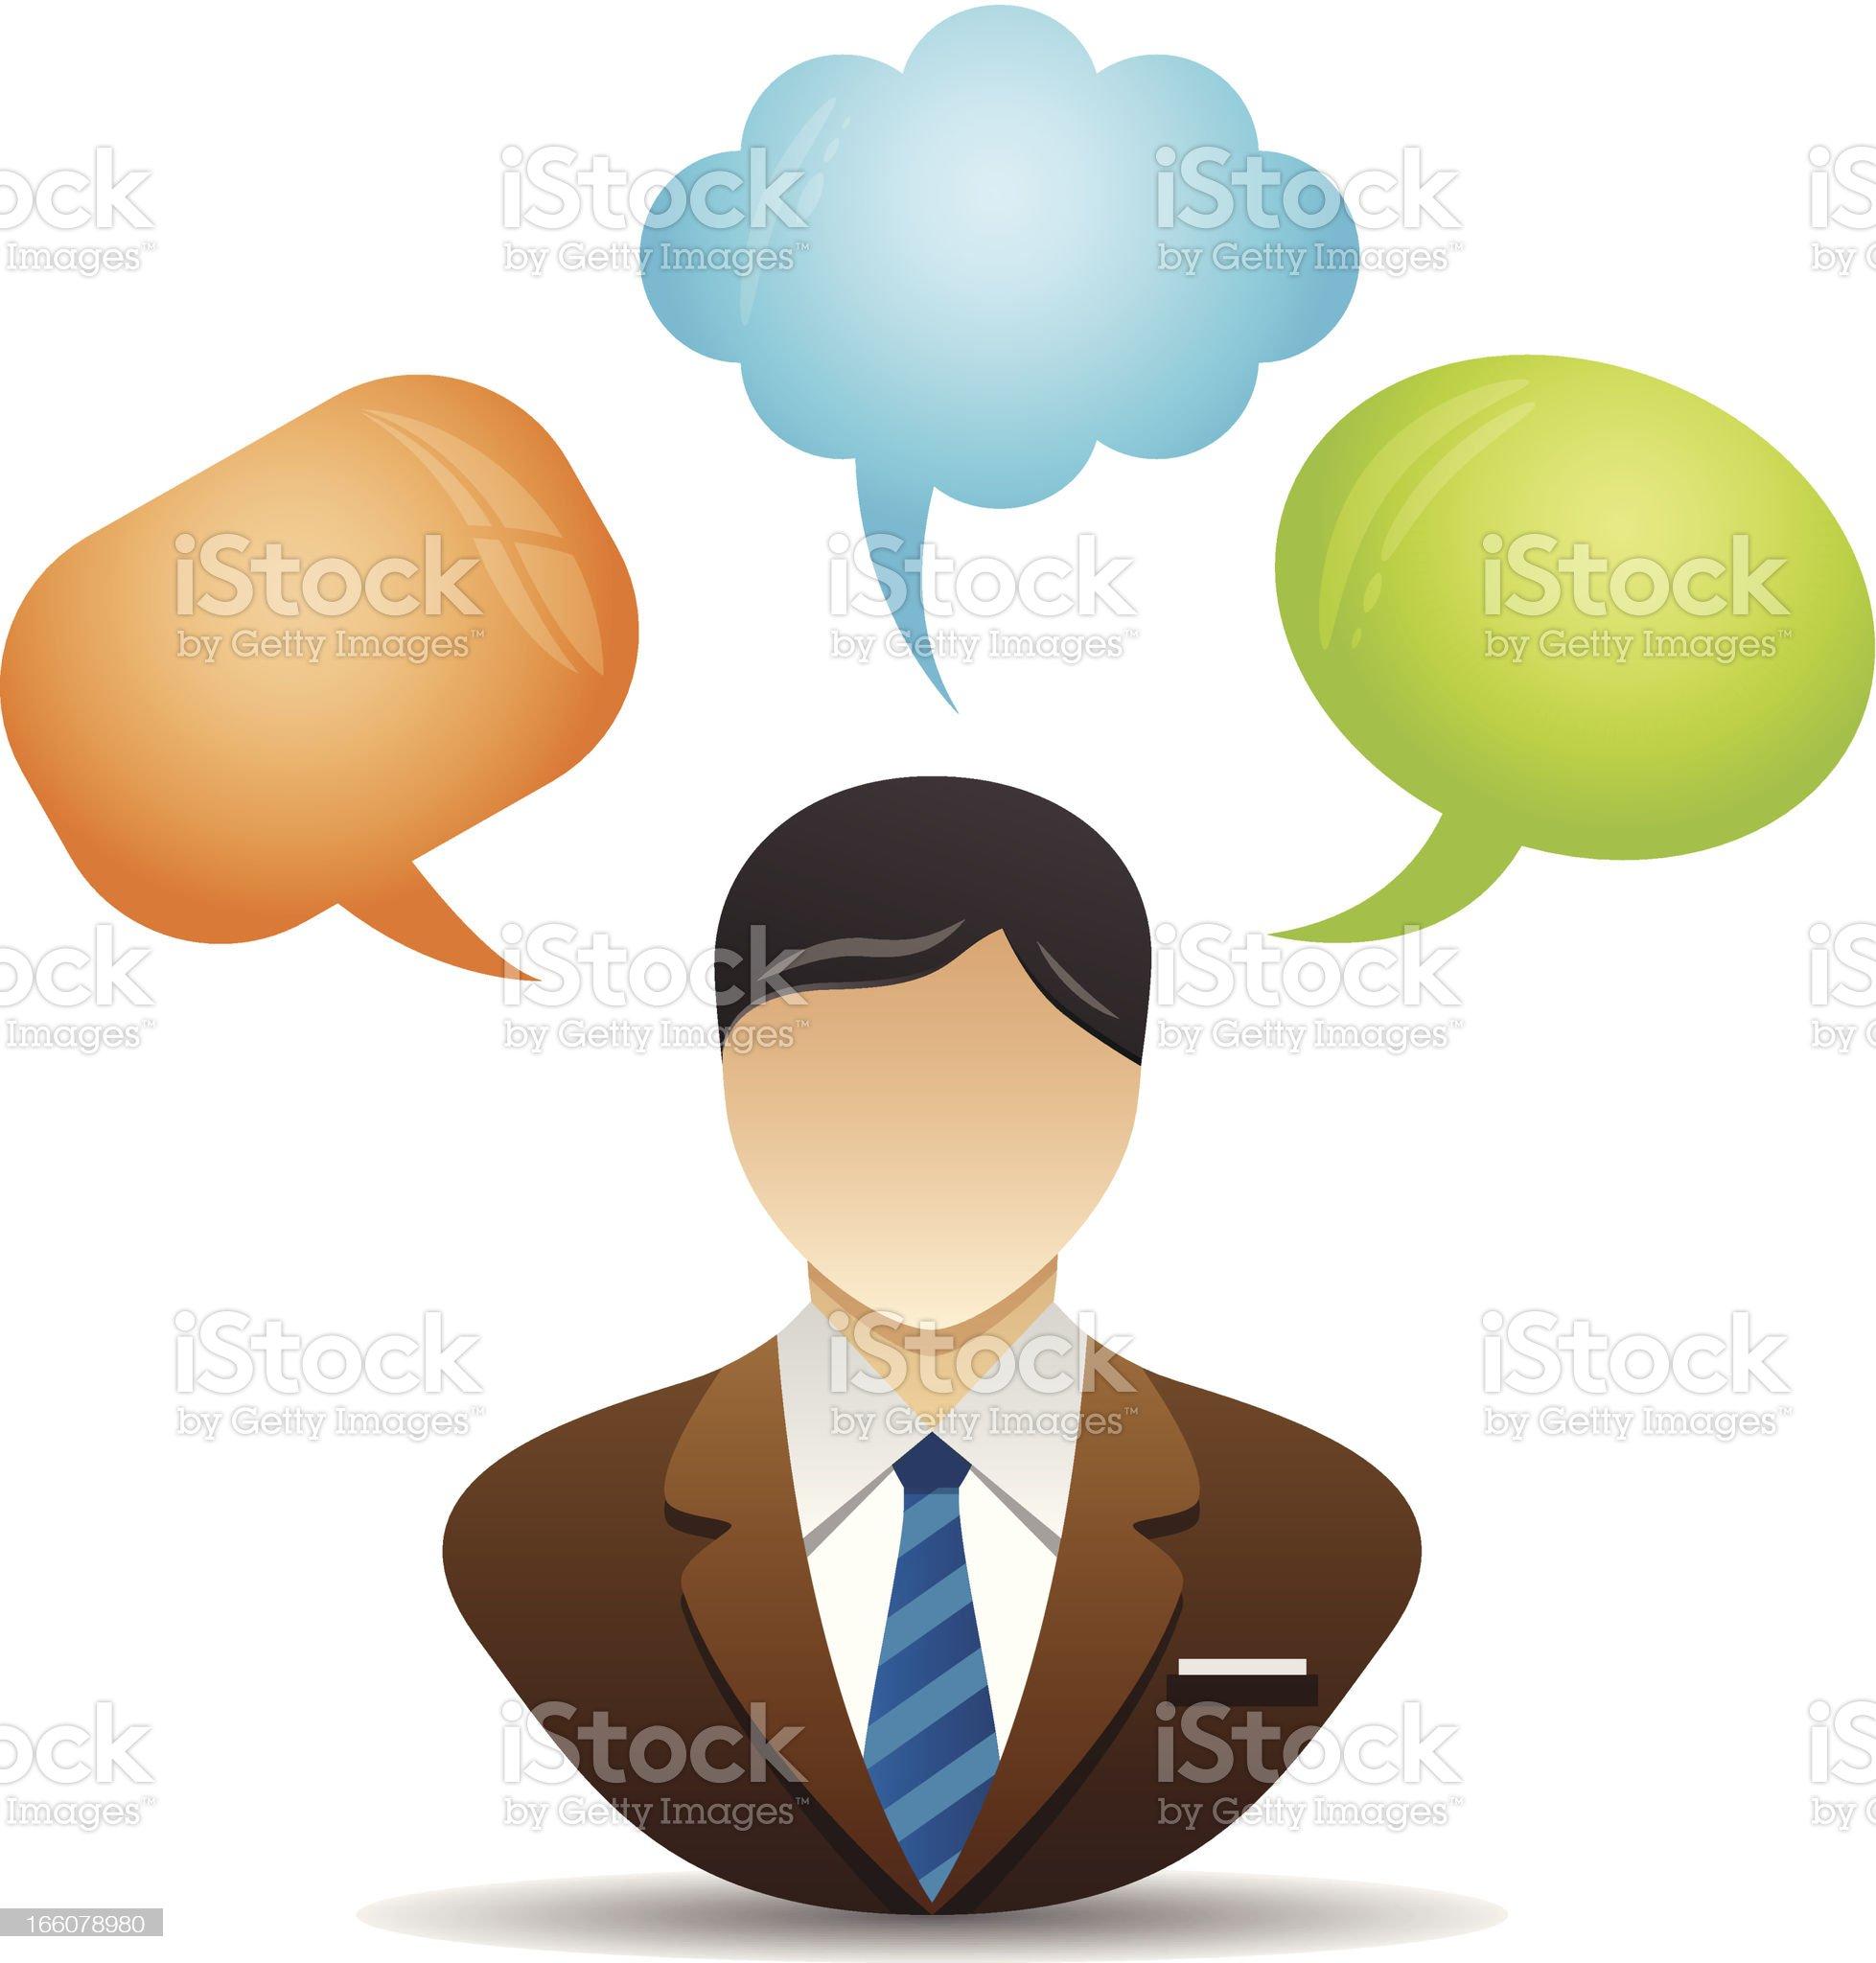 Speech bubble -Business man royalty-free stock vector art